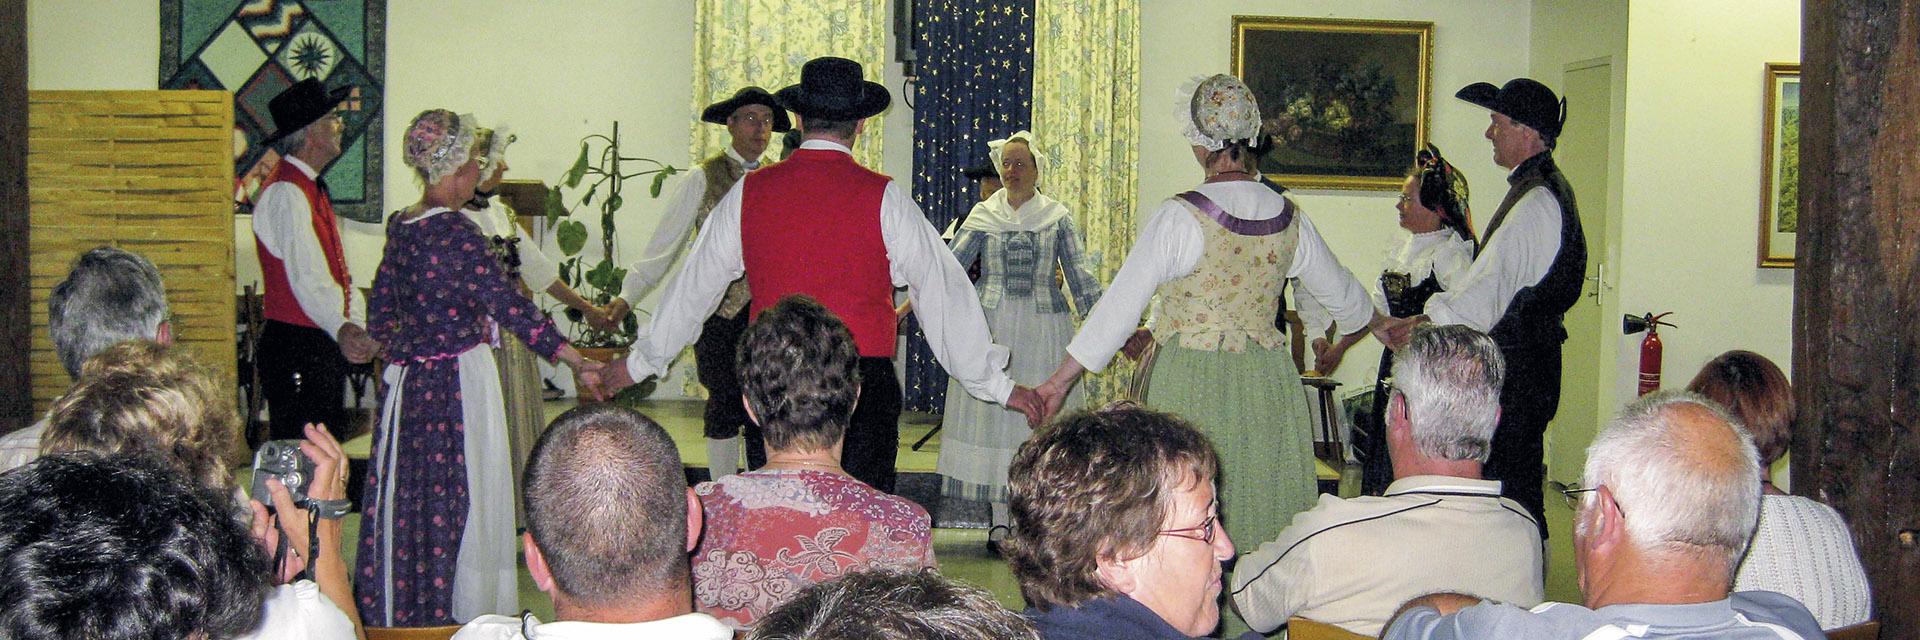 village-vacance-relais-saint-bernard-soiree-groupe-annimation